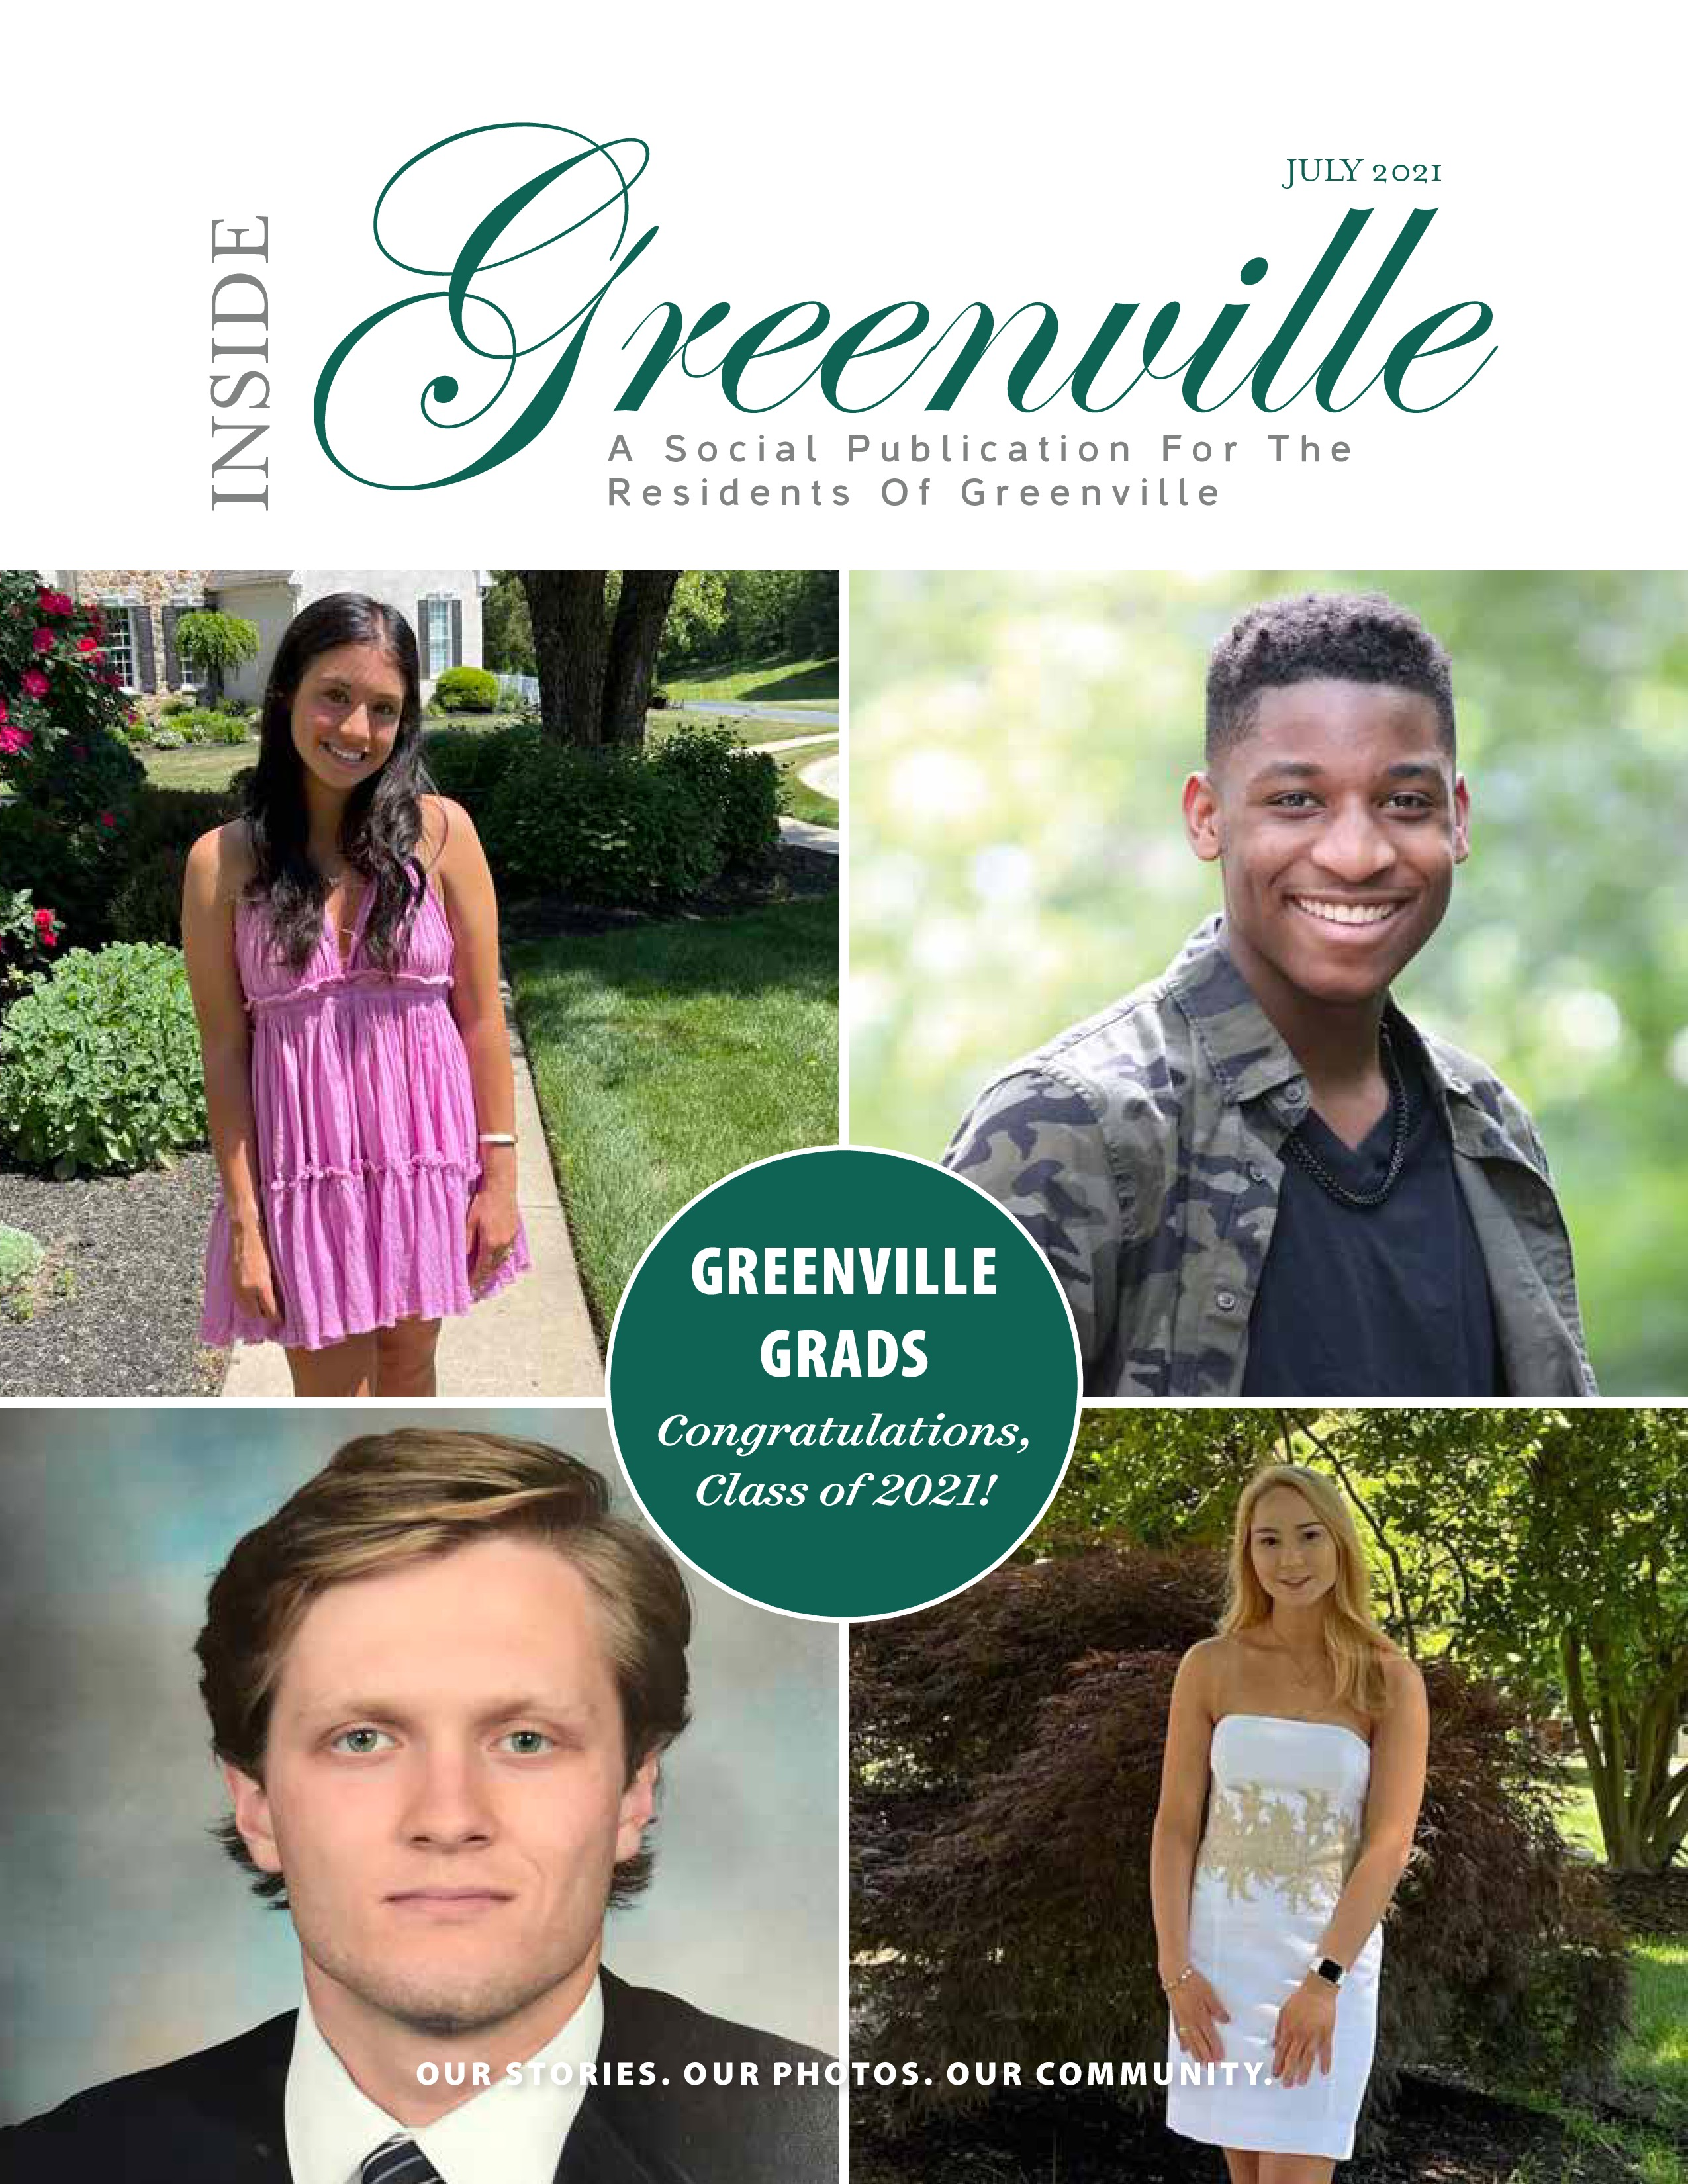 Inside Greenville 2021-07-01